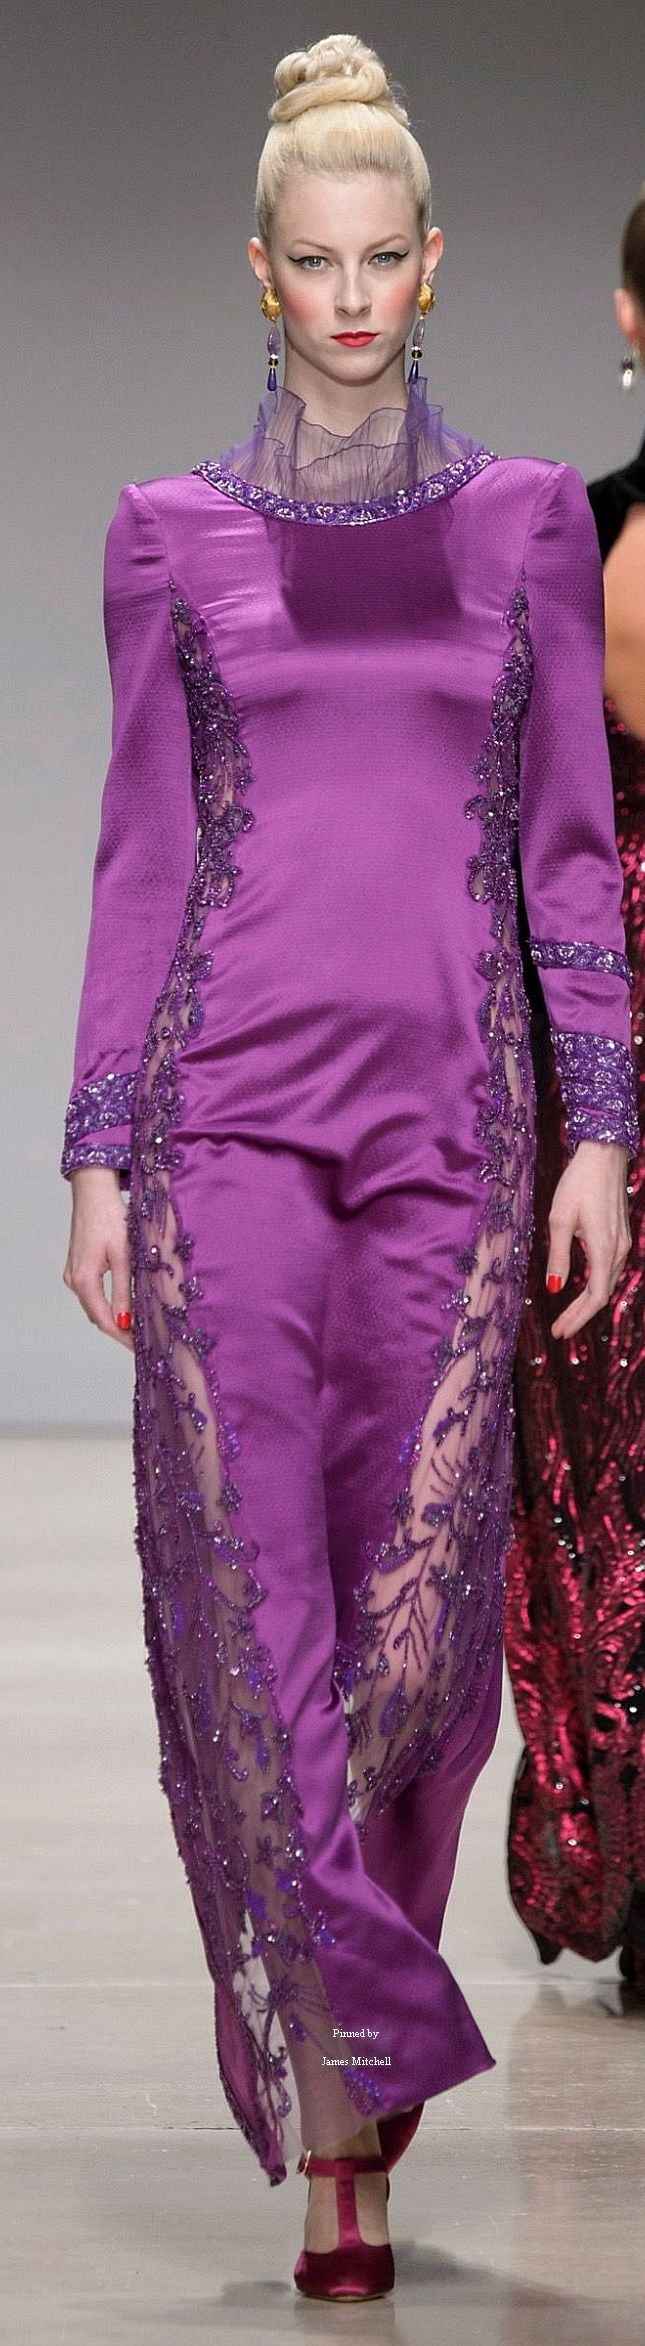 best islam платье images on Pinterest Curve dresses Indian